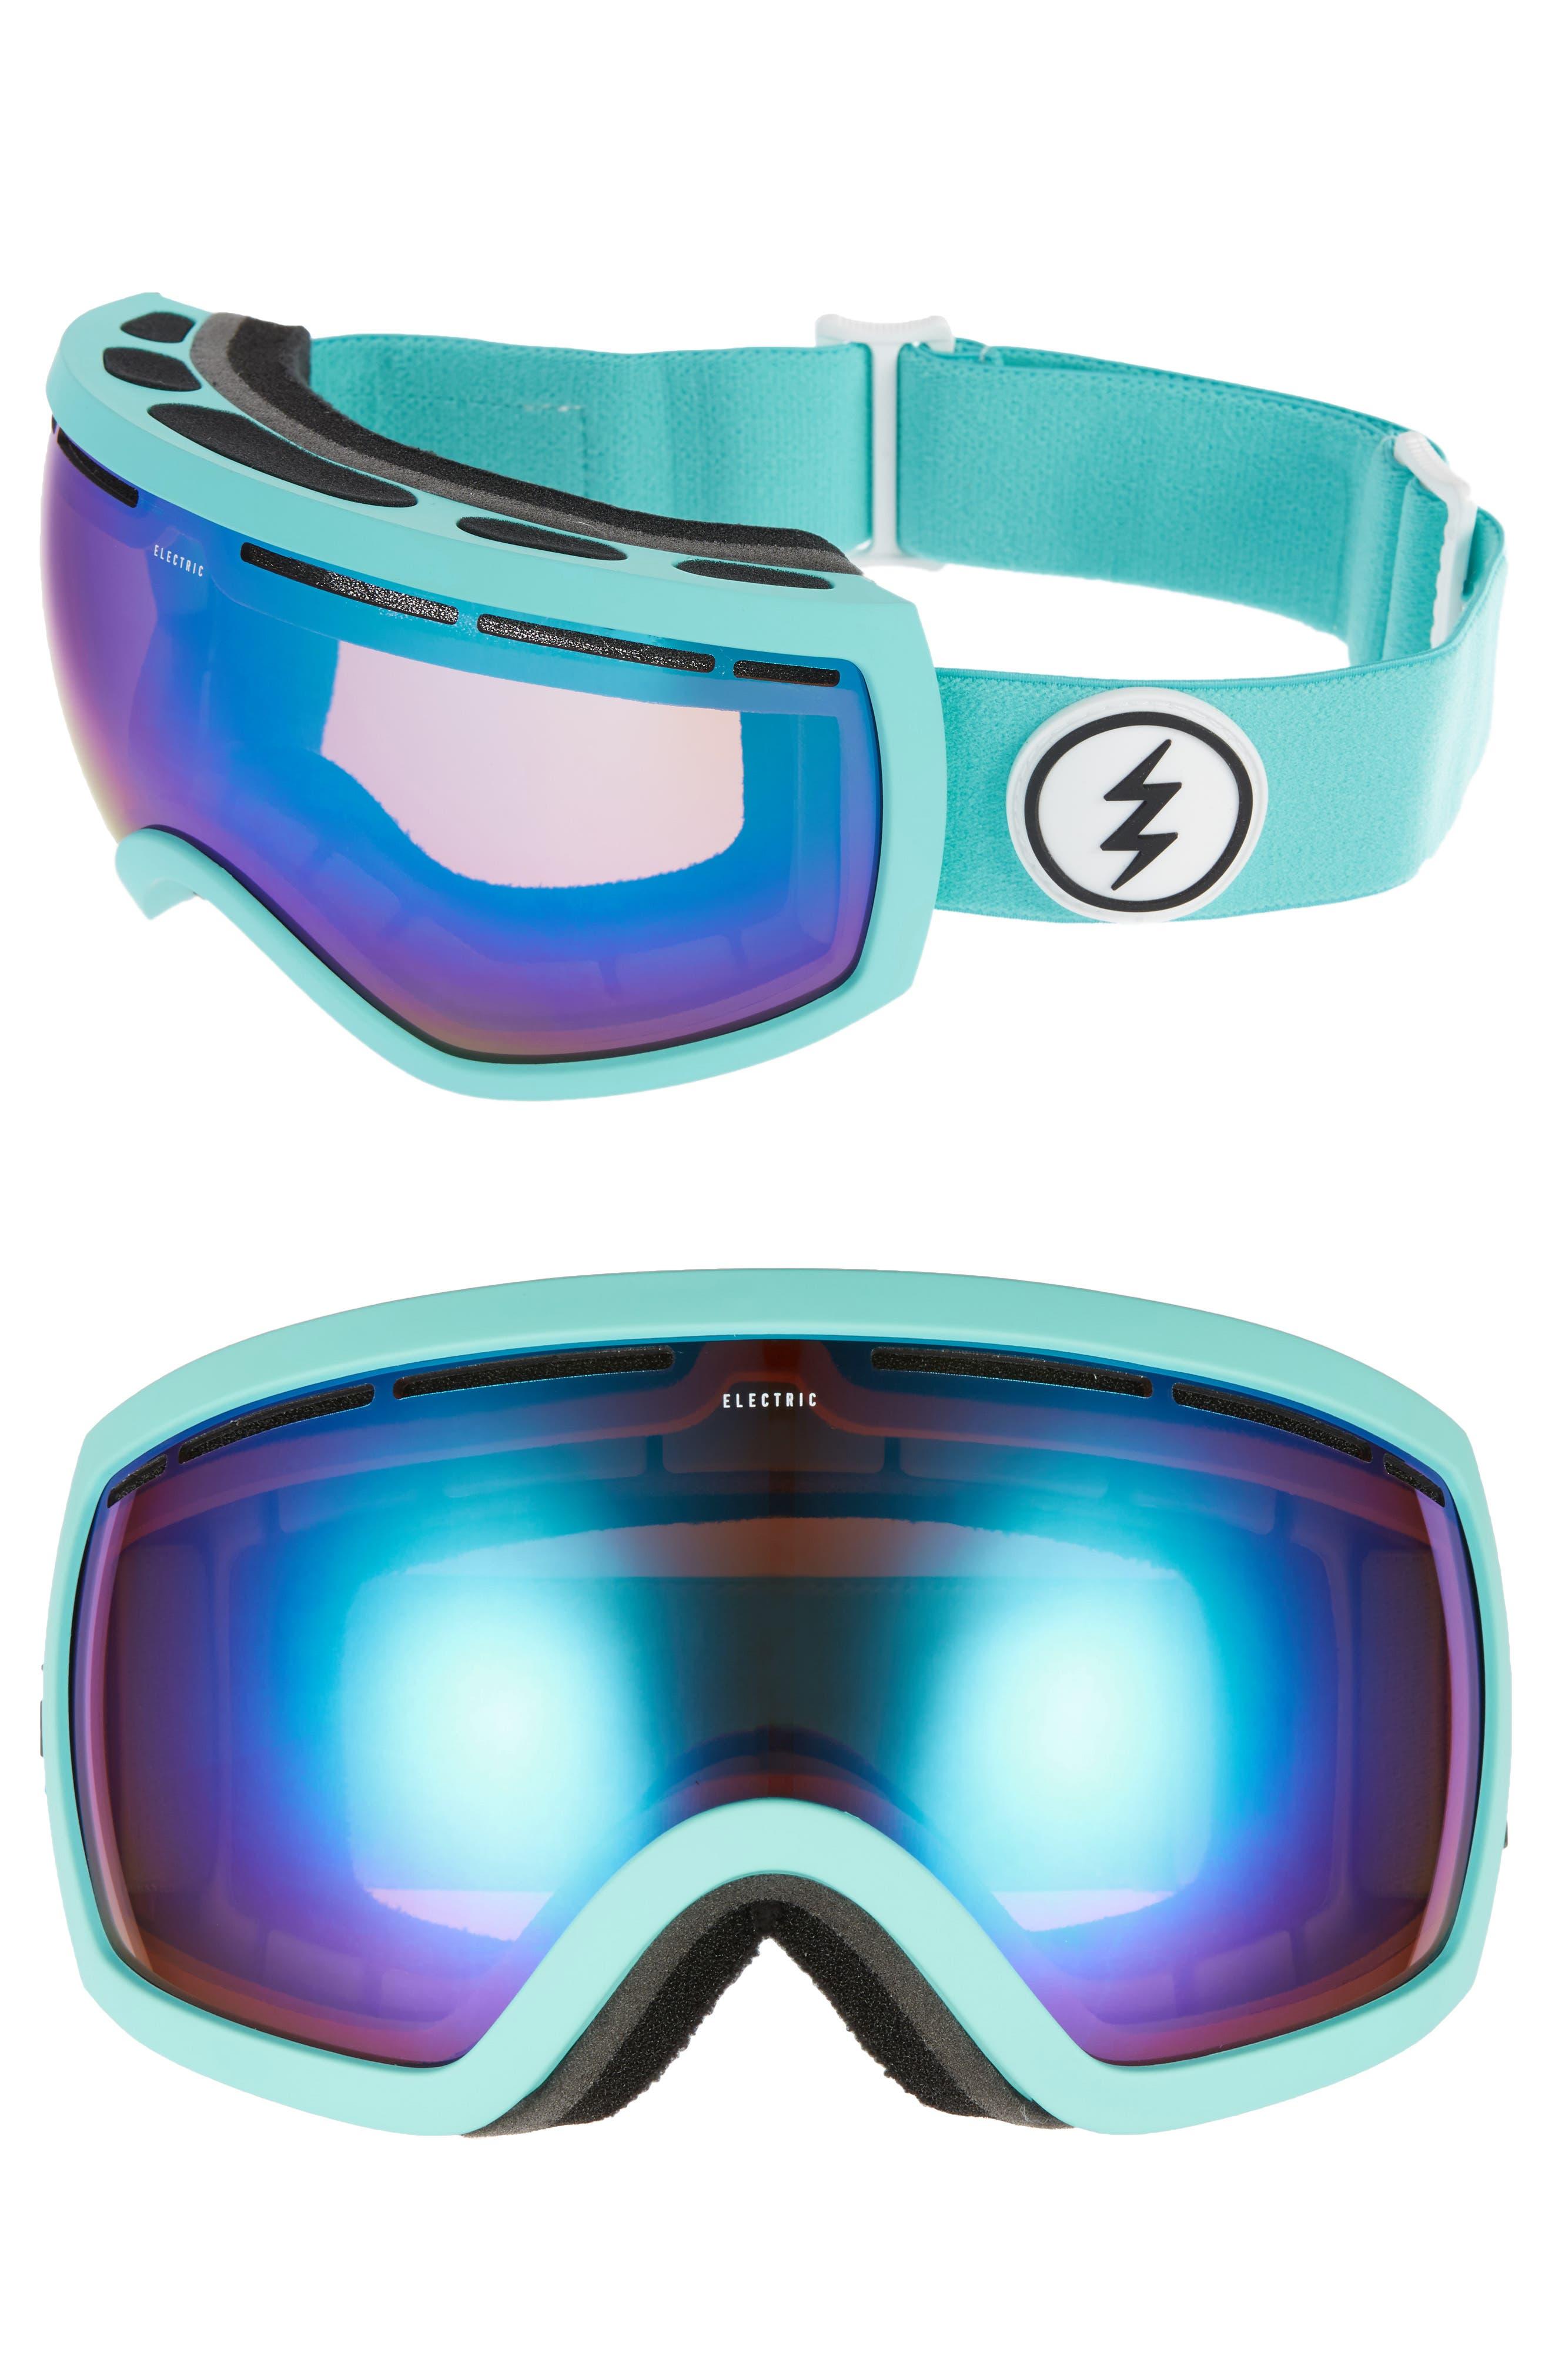 EG2.5 Snow Goggles,                             Main thumbnail 4, color,